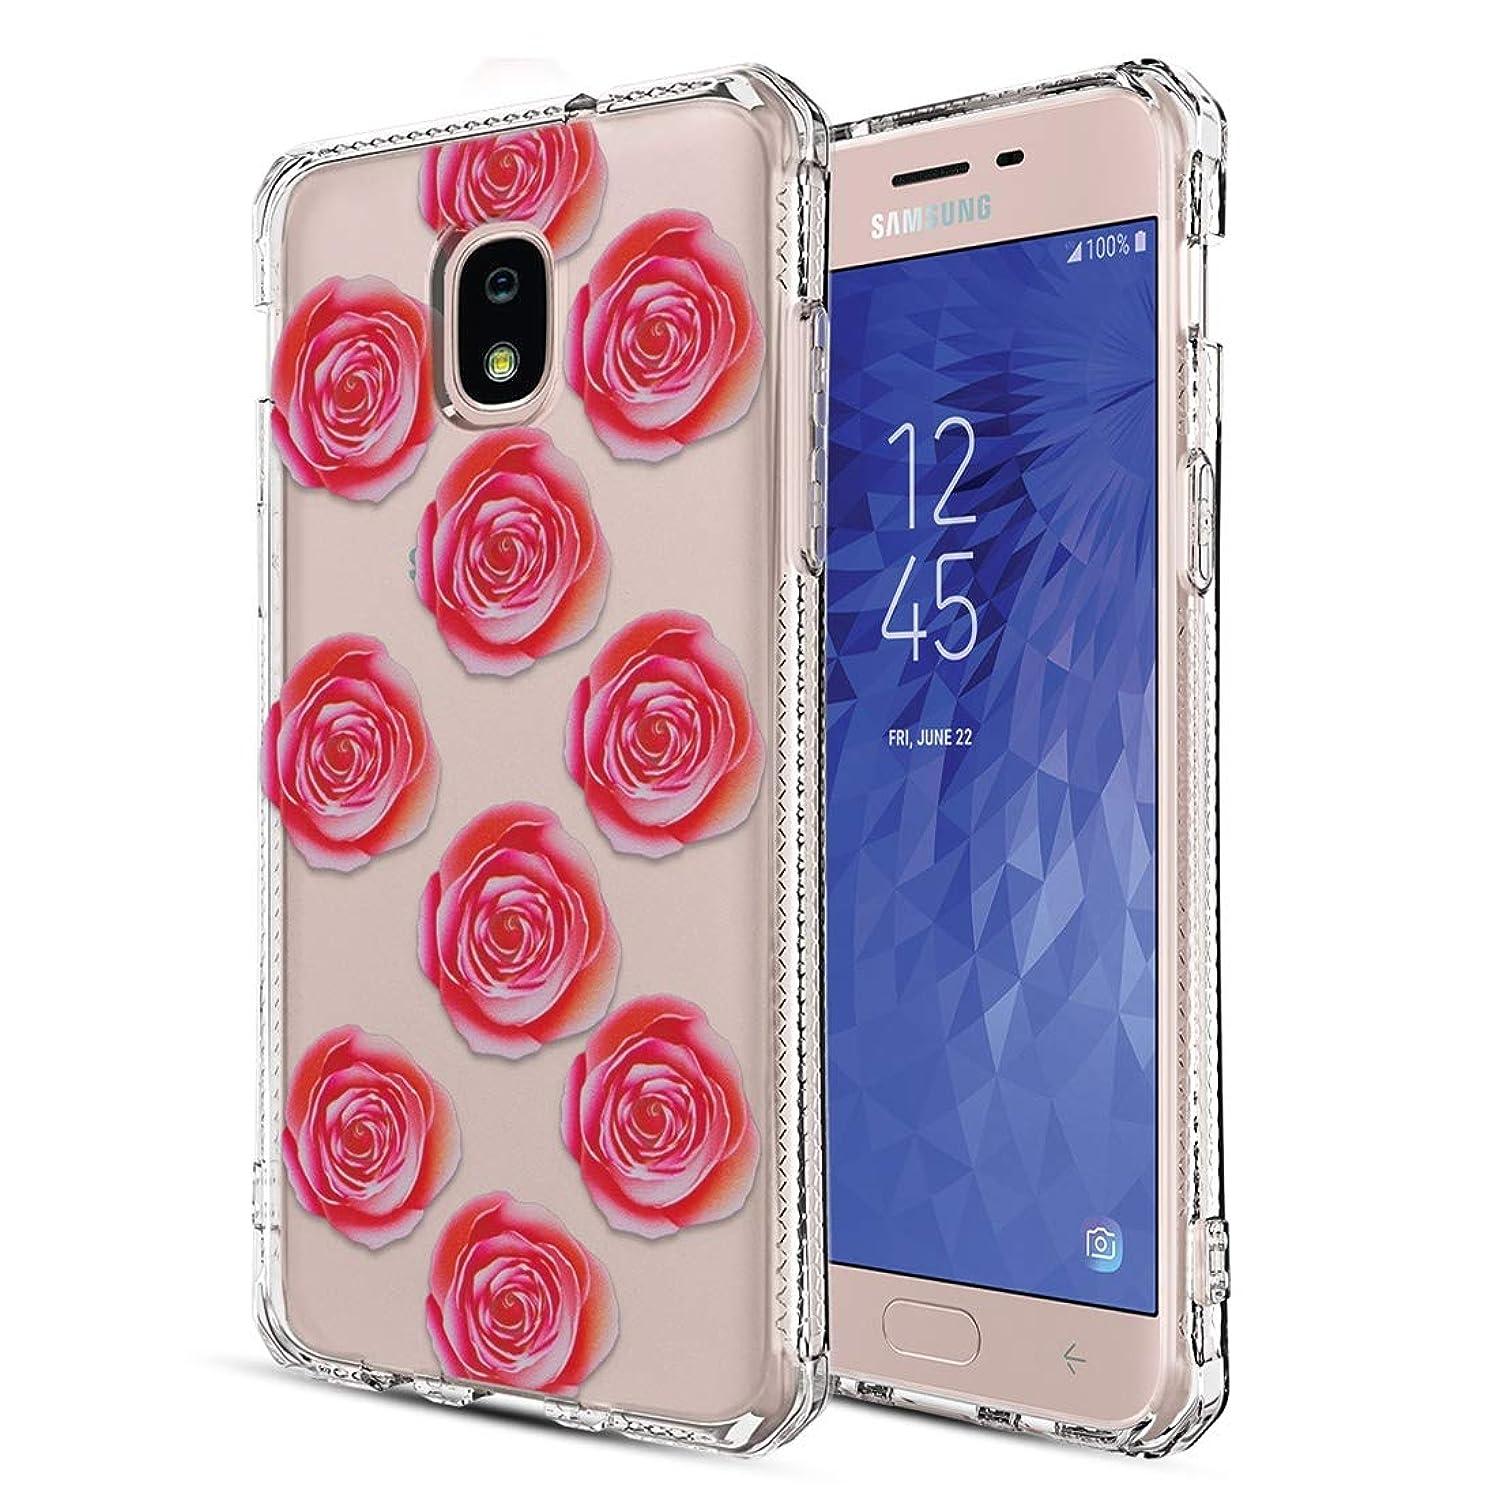 Samsung Galaxy J7 2018 Case,J7 Refine/J7 Star/J7 V 2nd Gen/J7 Crown/J7 TOP/J7 Aero /J7 Eon/J7 Aura Phone Case with Shockproof Slim Clear Floral Pattern Soft Flexible TPU Phone Cover,Rose Flower